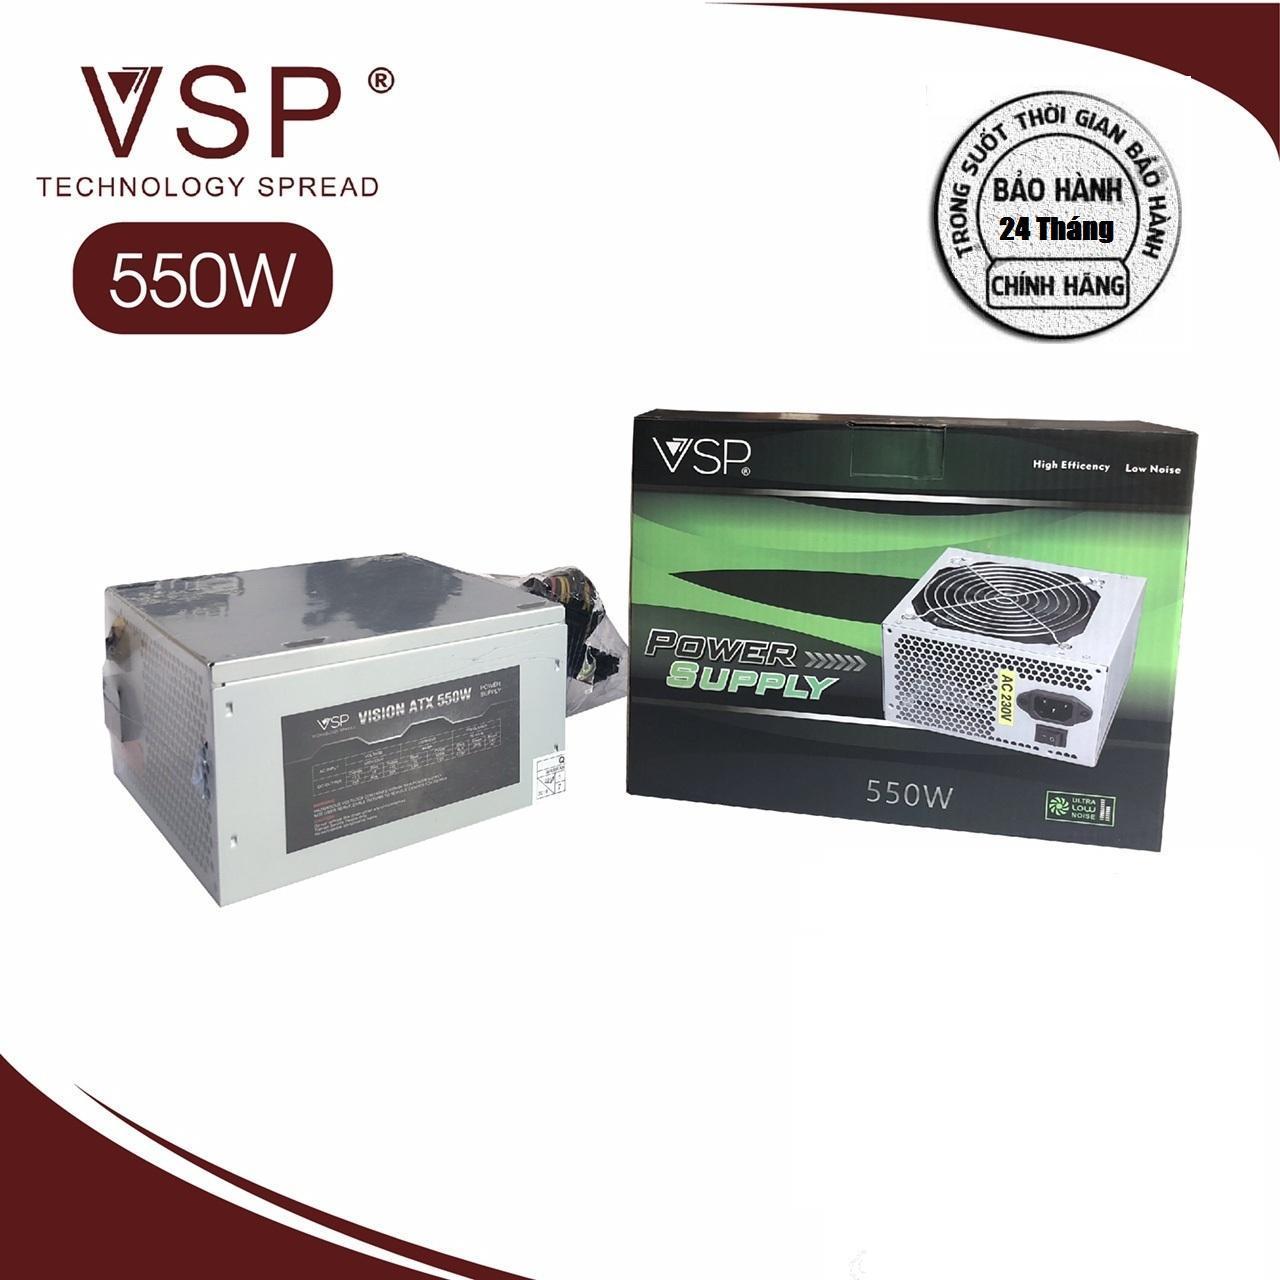 Giá VSP 550W- Full box